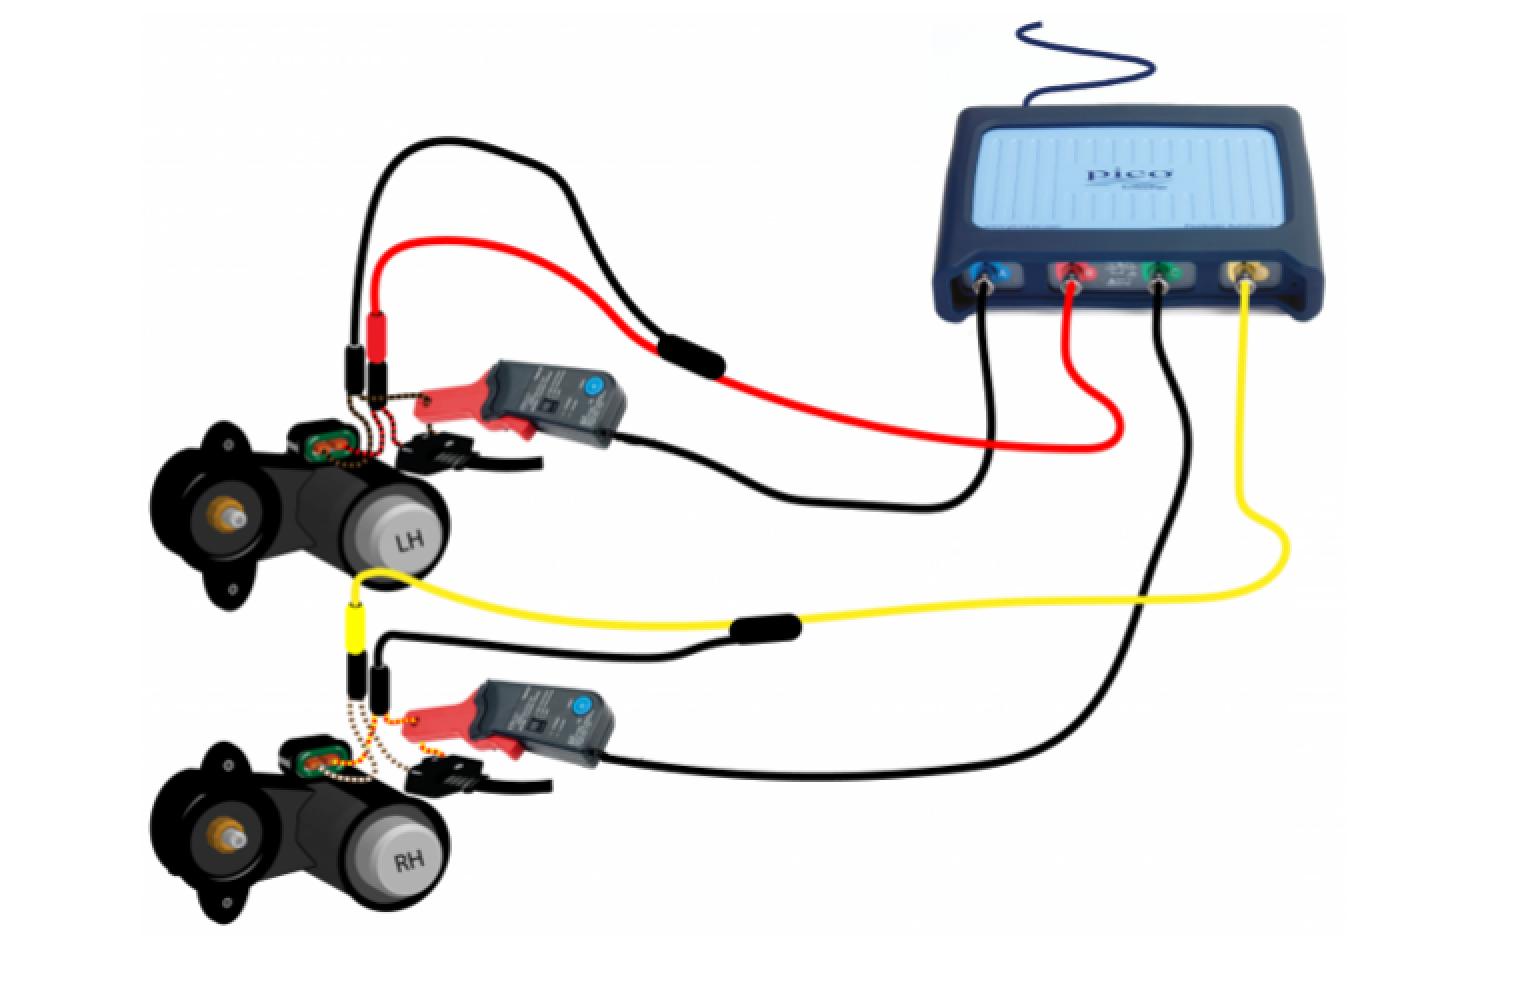 Systematic diagnostics with PicoScope solves Audi A6 Quattro